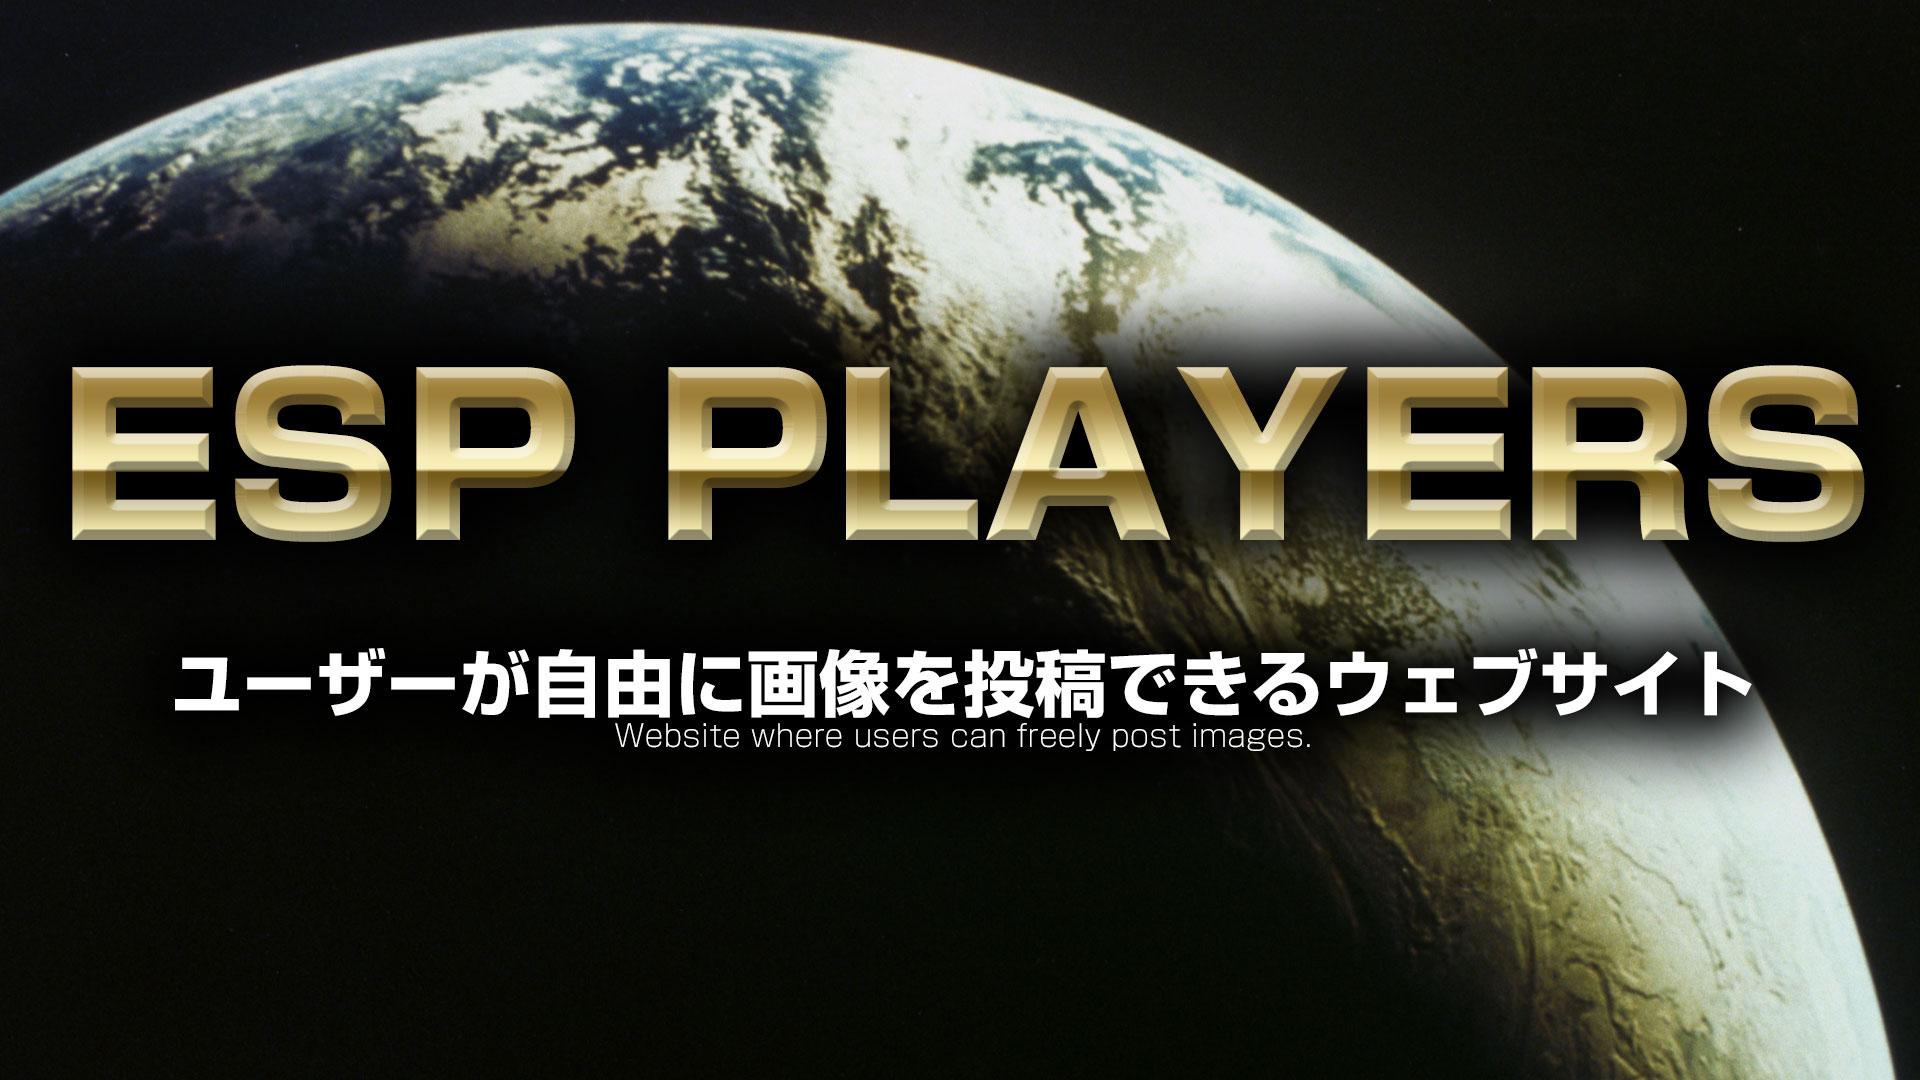 ESP PLAYERS